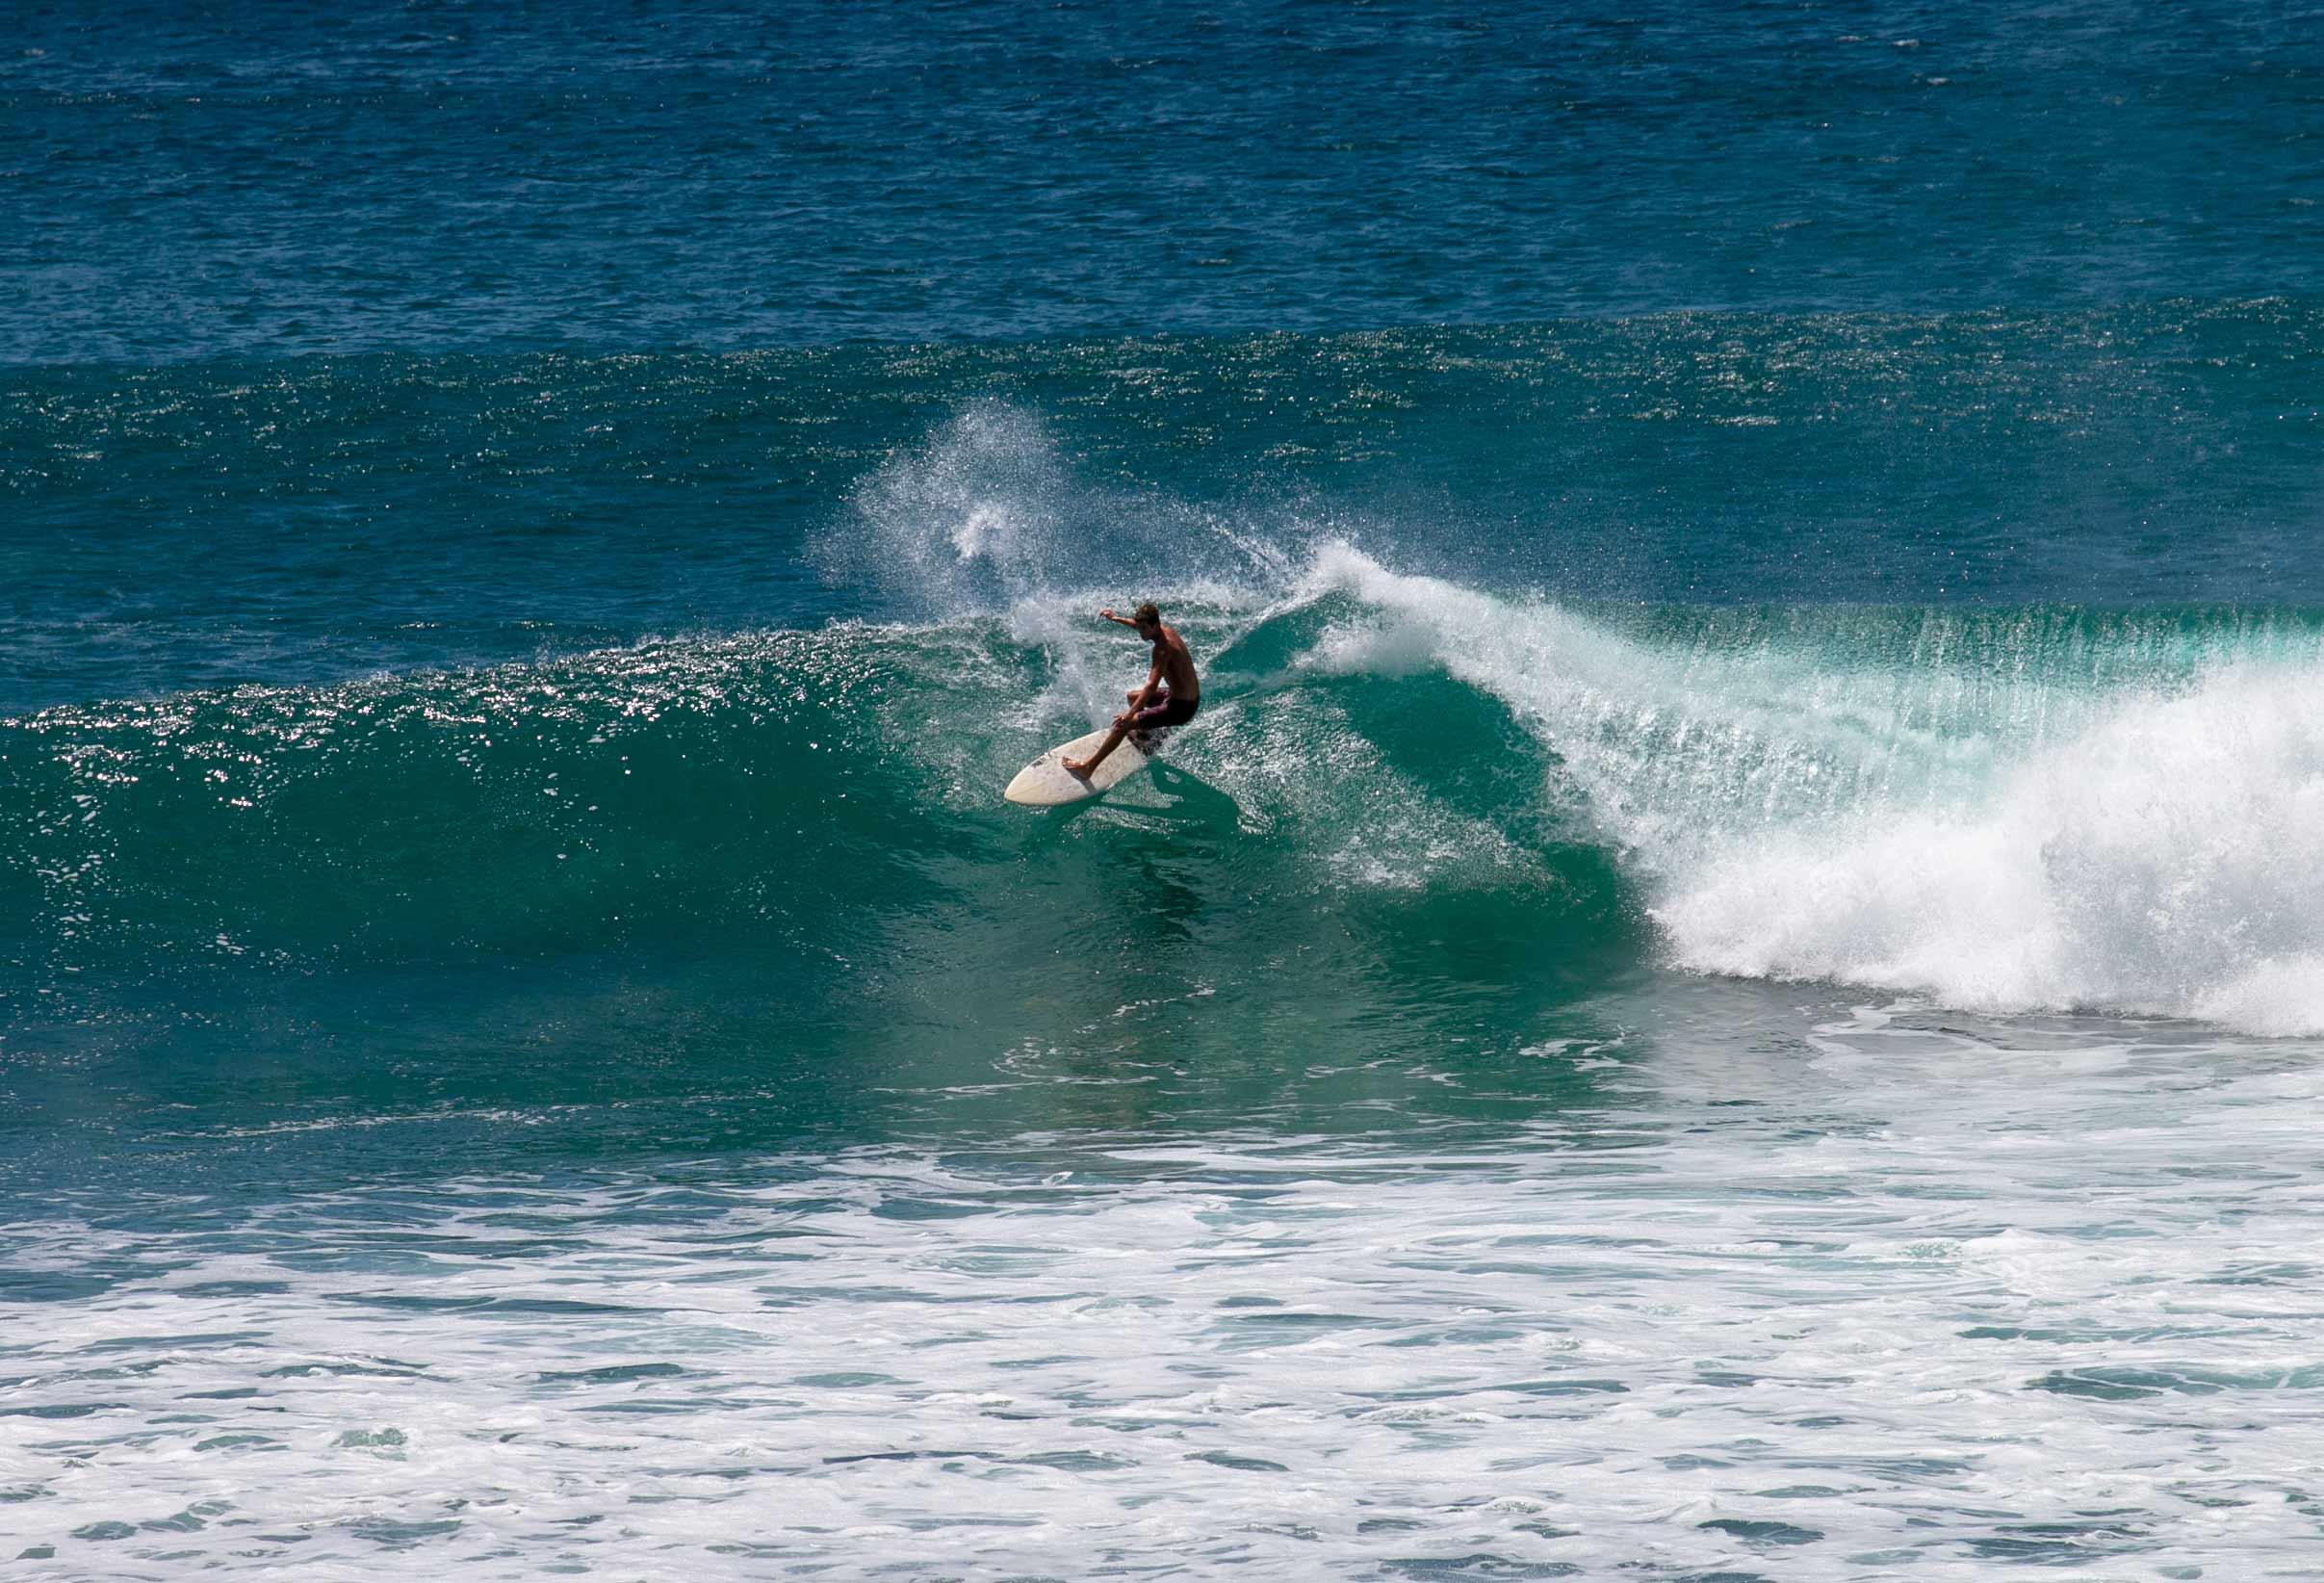 Surfing at Popoyo Nicaragua